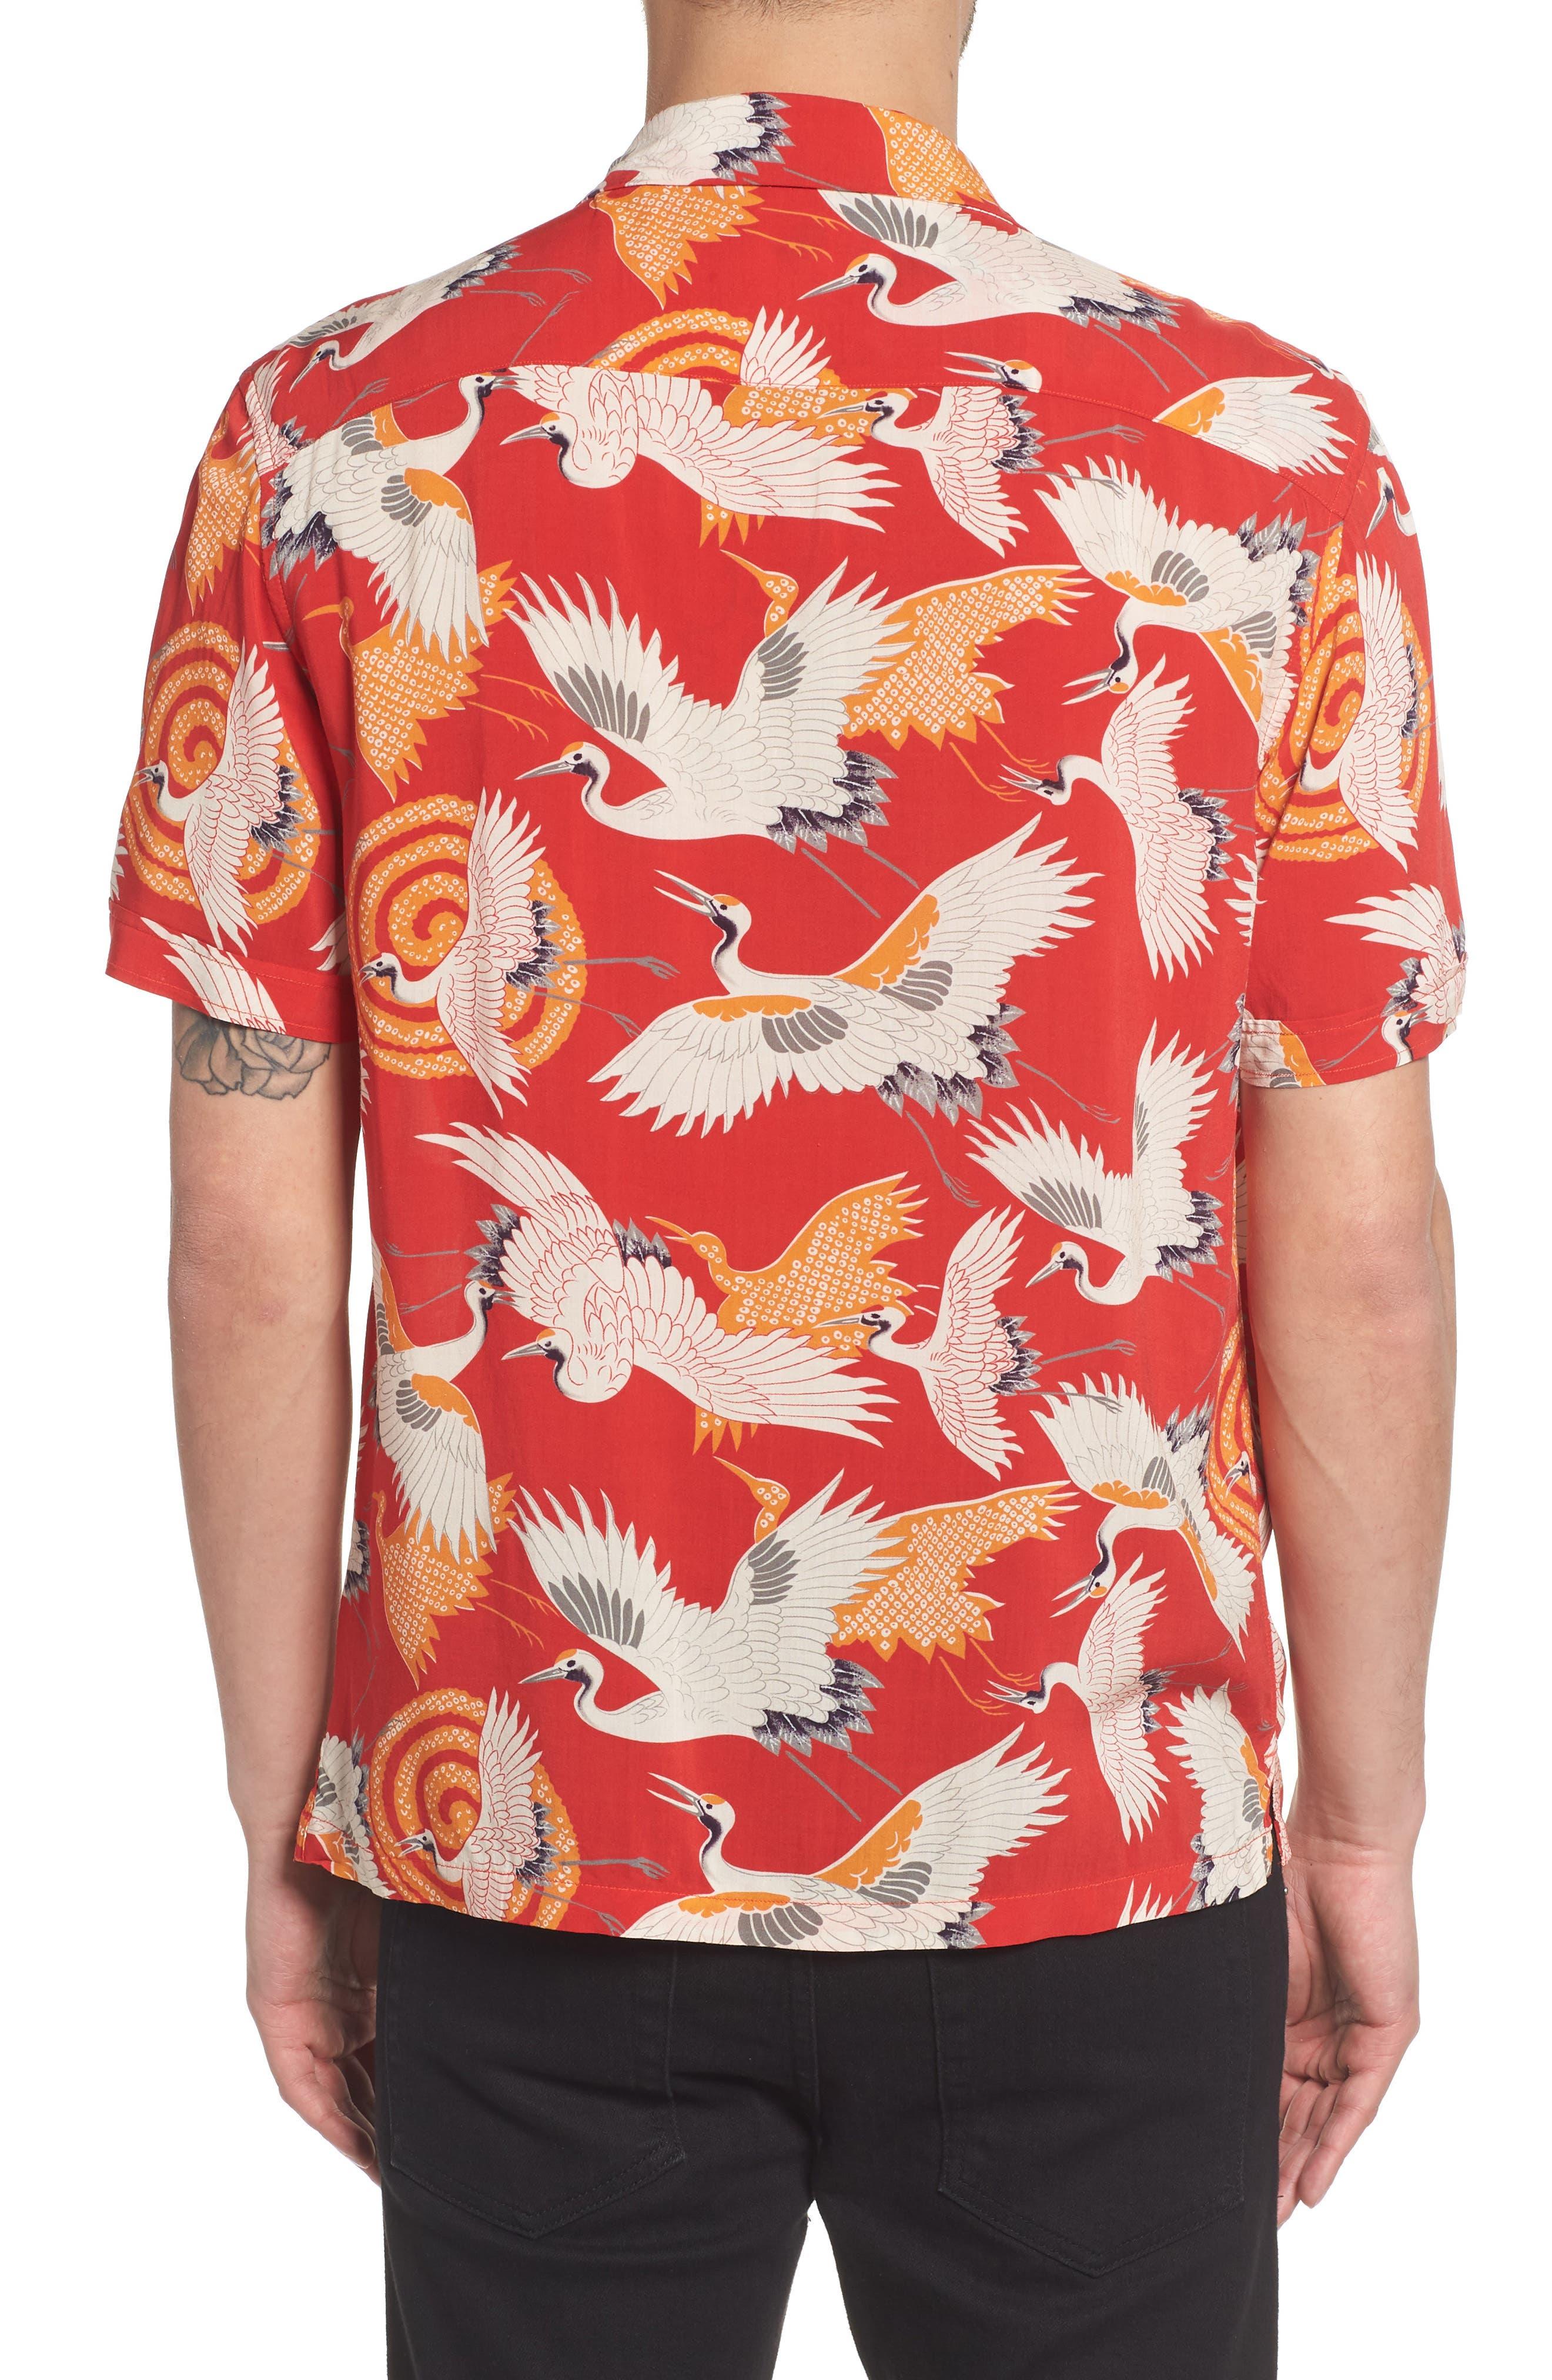 Tsuru Regular Fit Short Sleeve Sport Shirt,                             Alternate thumbnail 3, color,                             Red